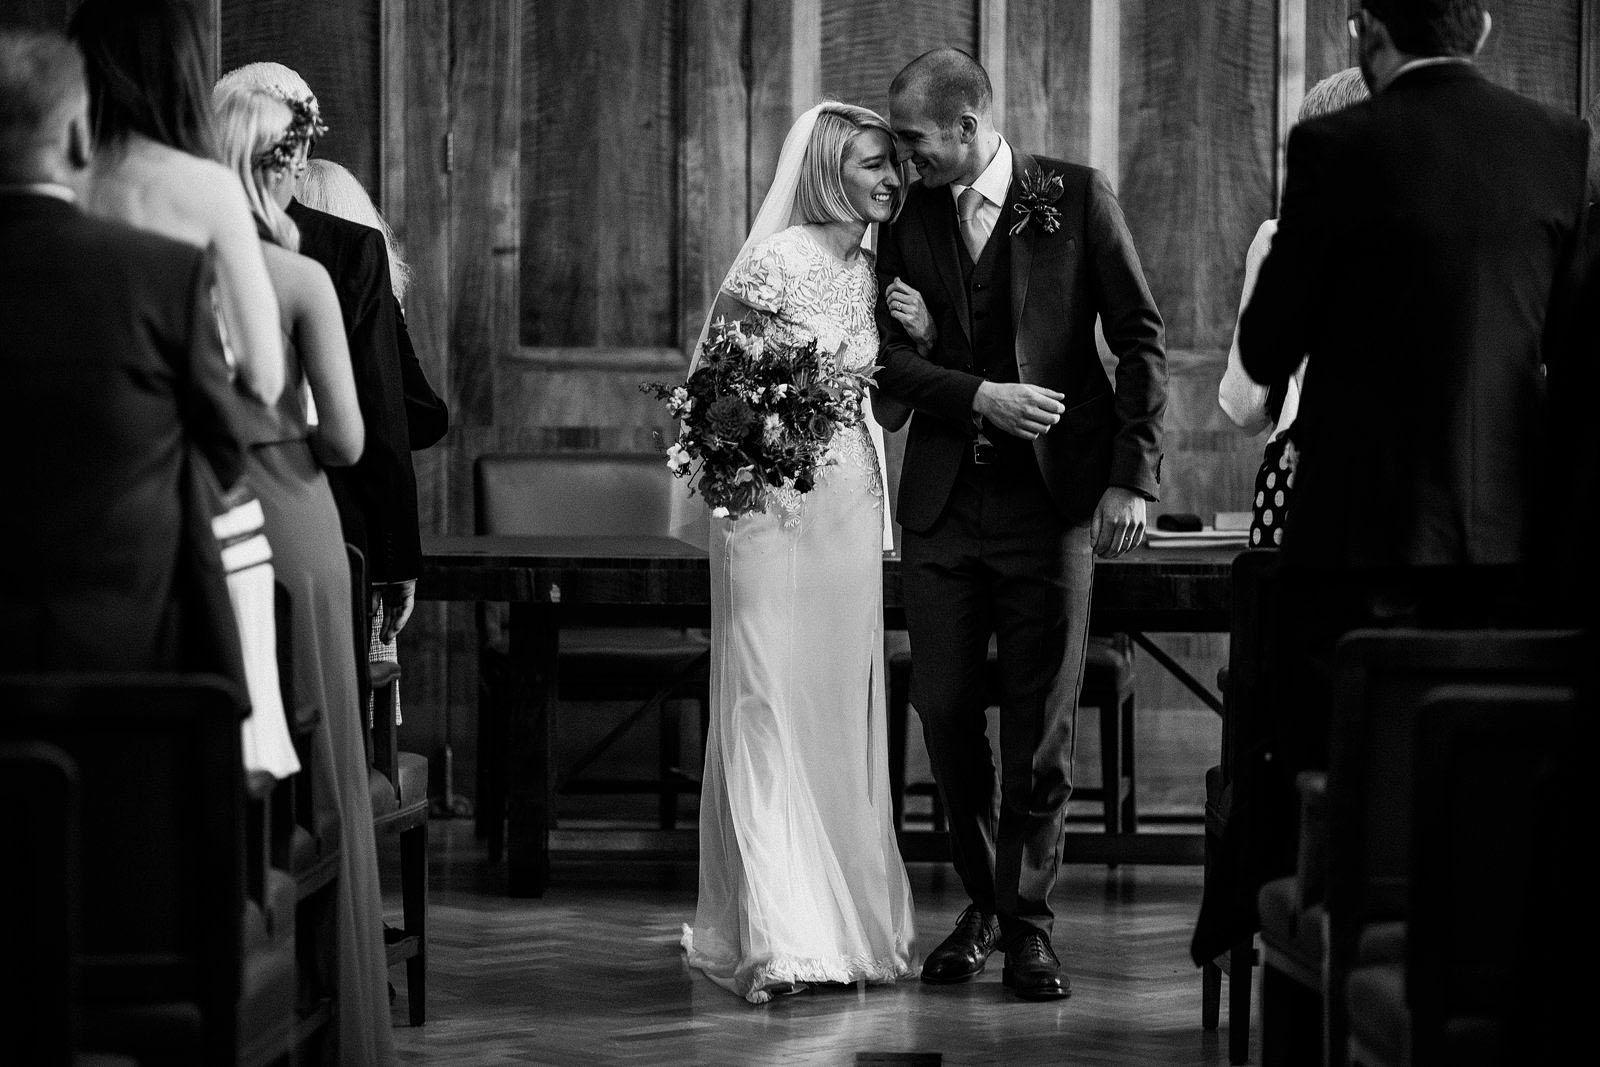 Hackney London wedding